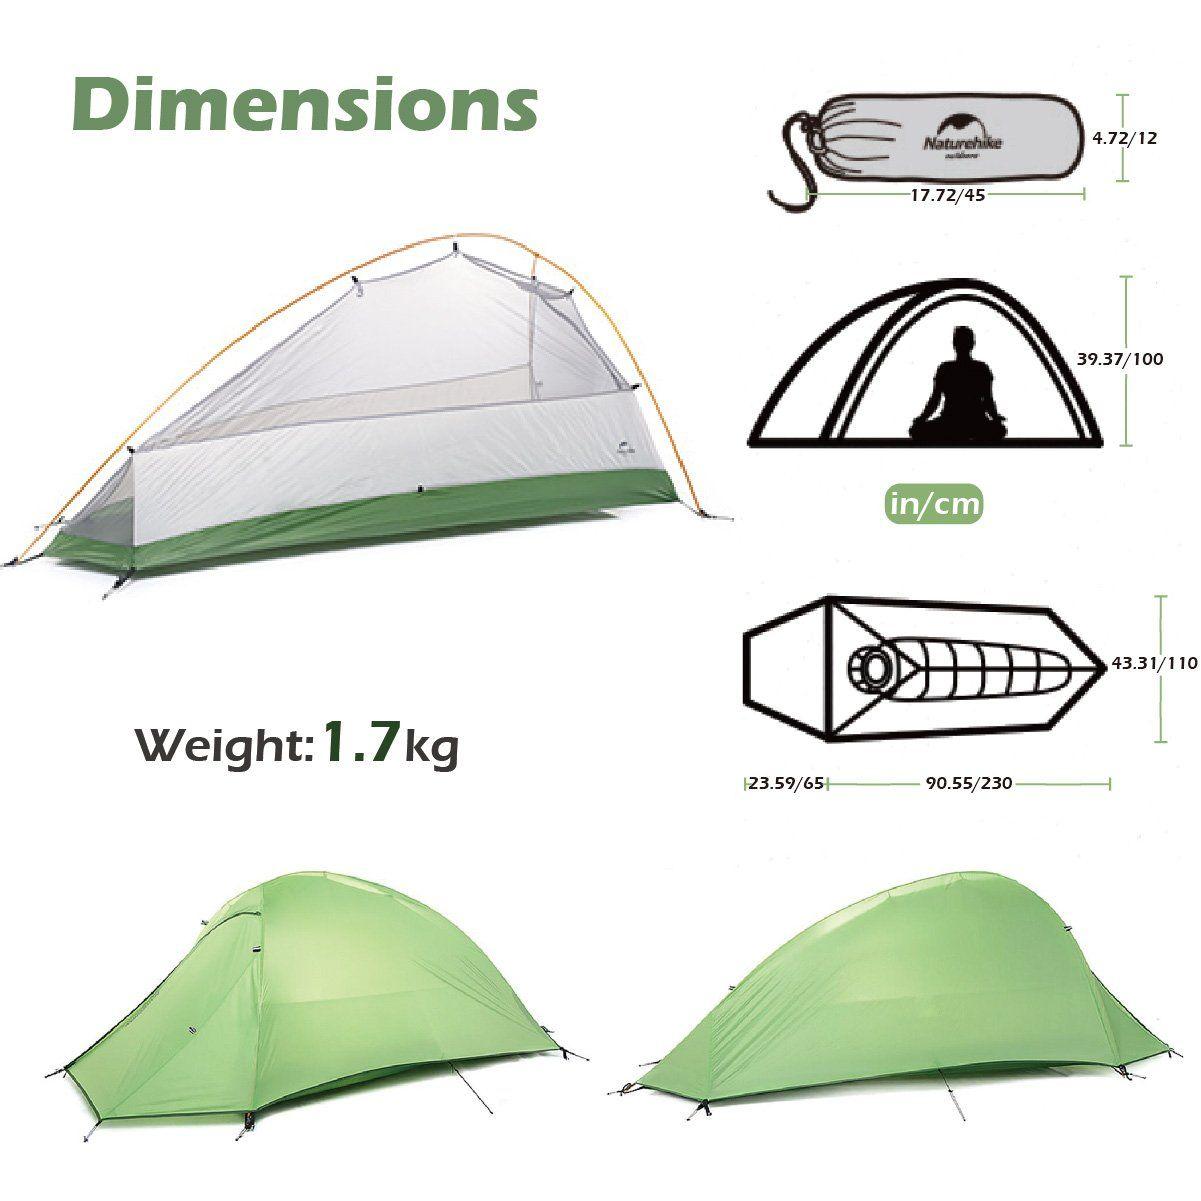 Triwonder 123 Person 4 Season Camping Tent Lightweight Waterproof